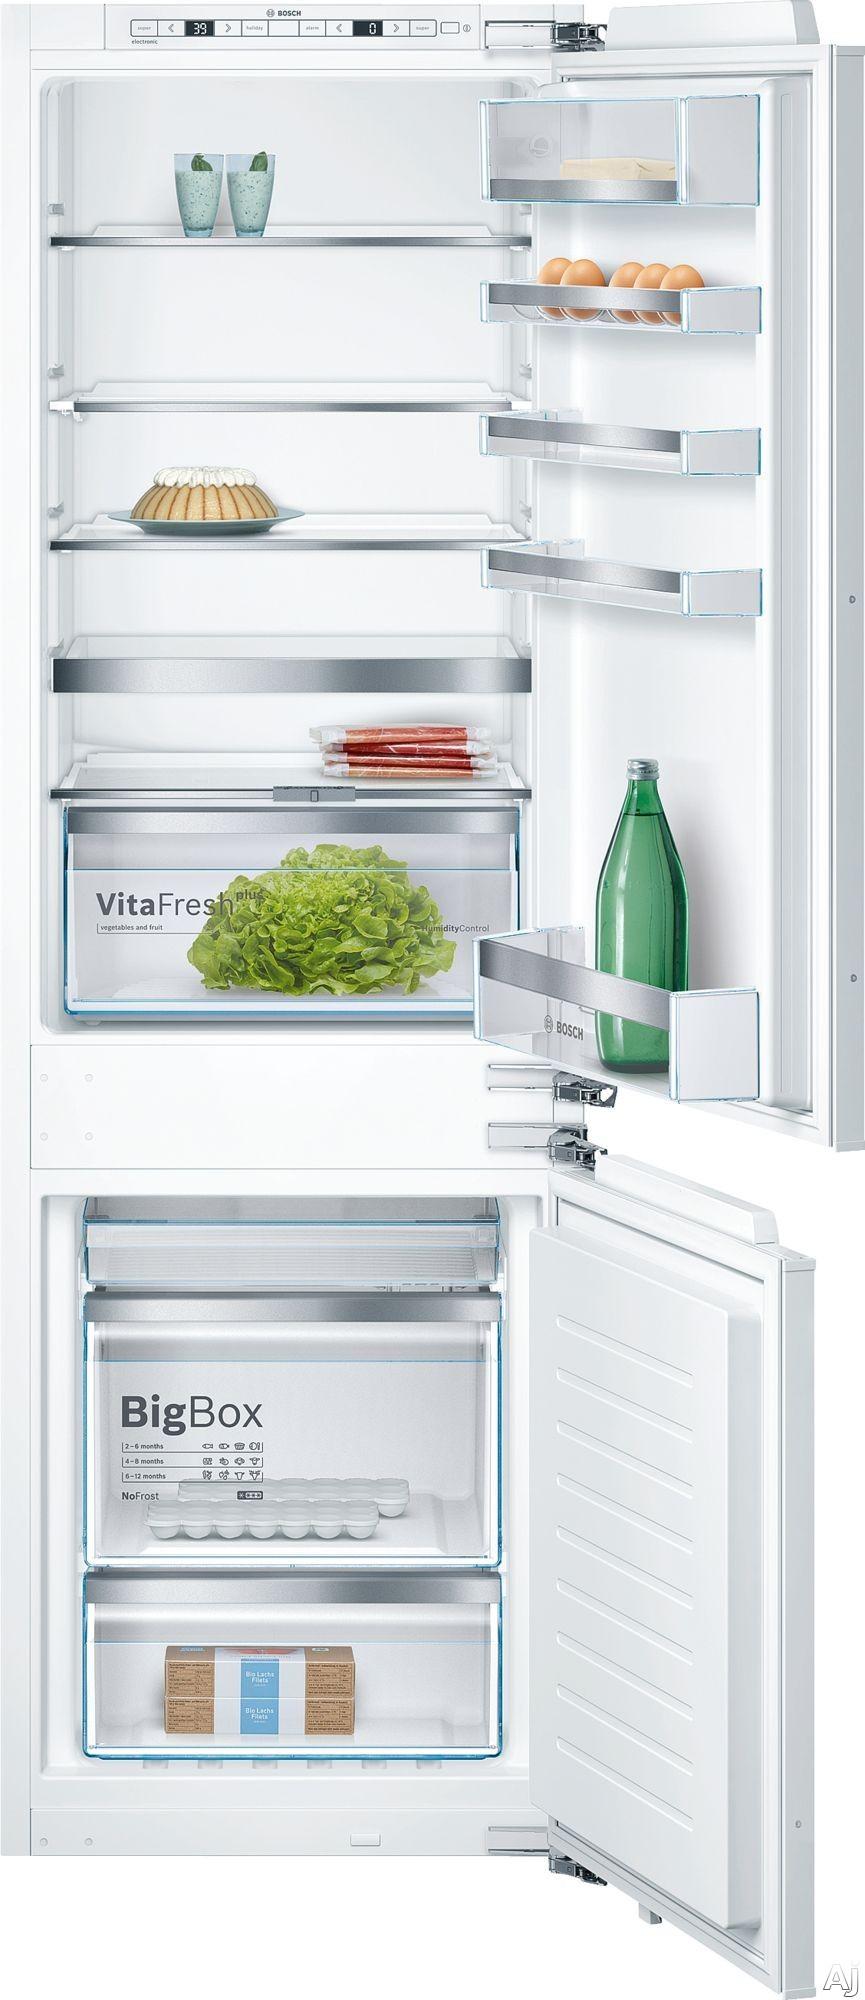 Bosch 800 Series B09IB81NSP 24 Inch Built-In Panel Ready Refrigerator with WiFi Home Connect, BigBox Freezer Drawer, Supercooling, SuperFreezing, VitaFresh® Pro Drawer, VarioShelf, Frost Free, Holi